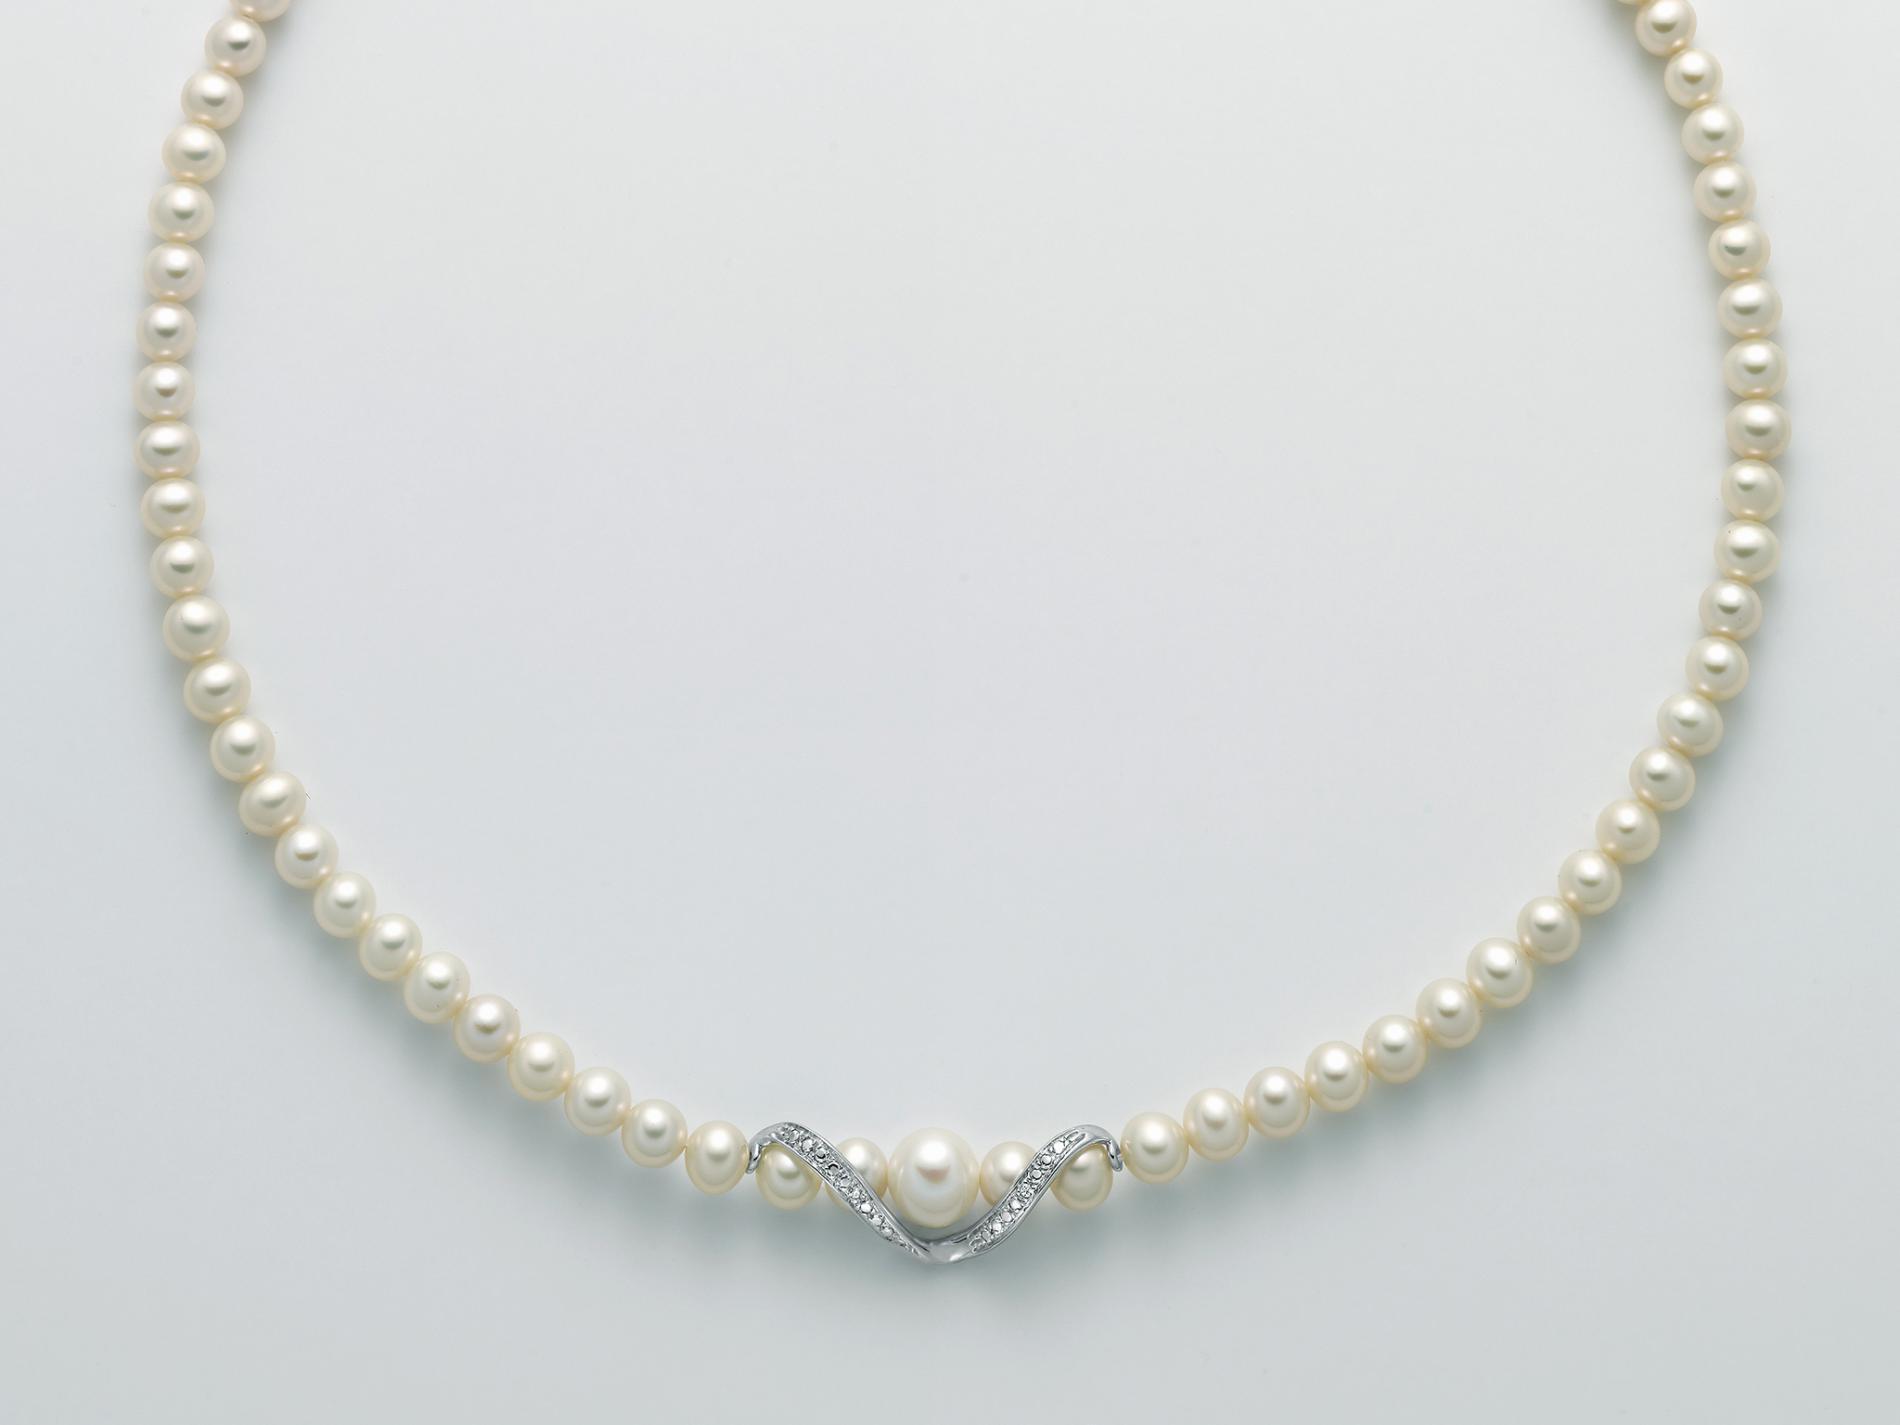 Collana filo perle Miluna PCL5531